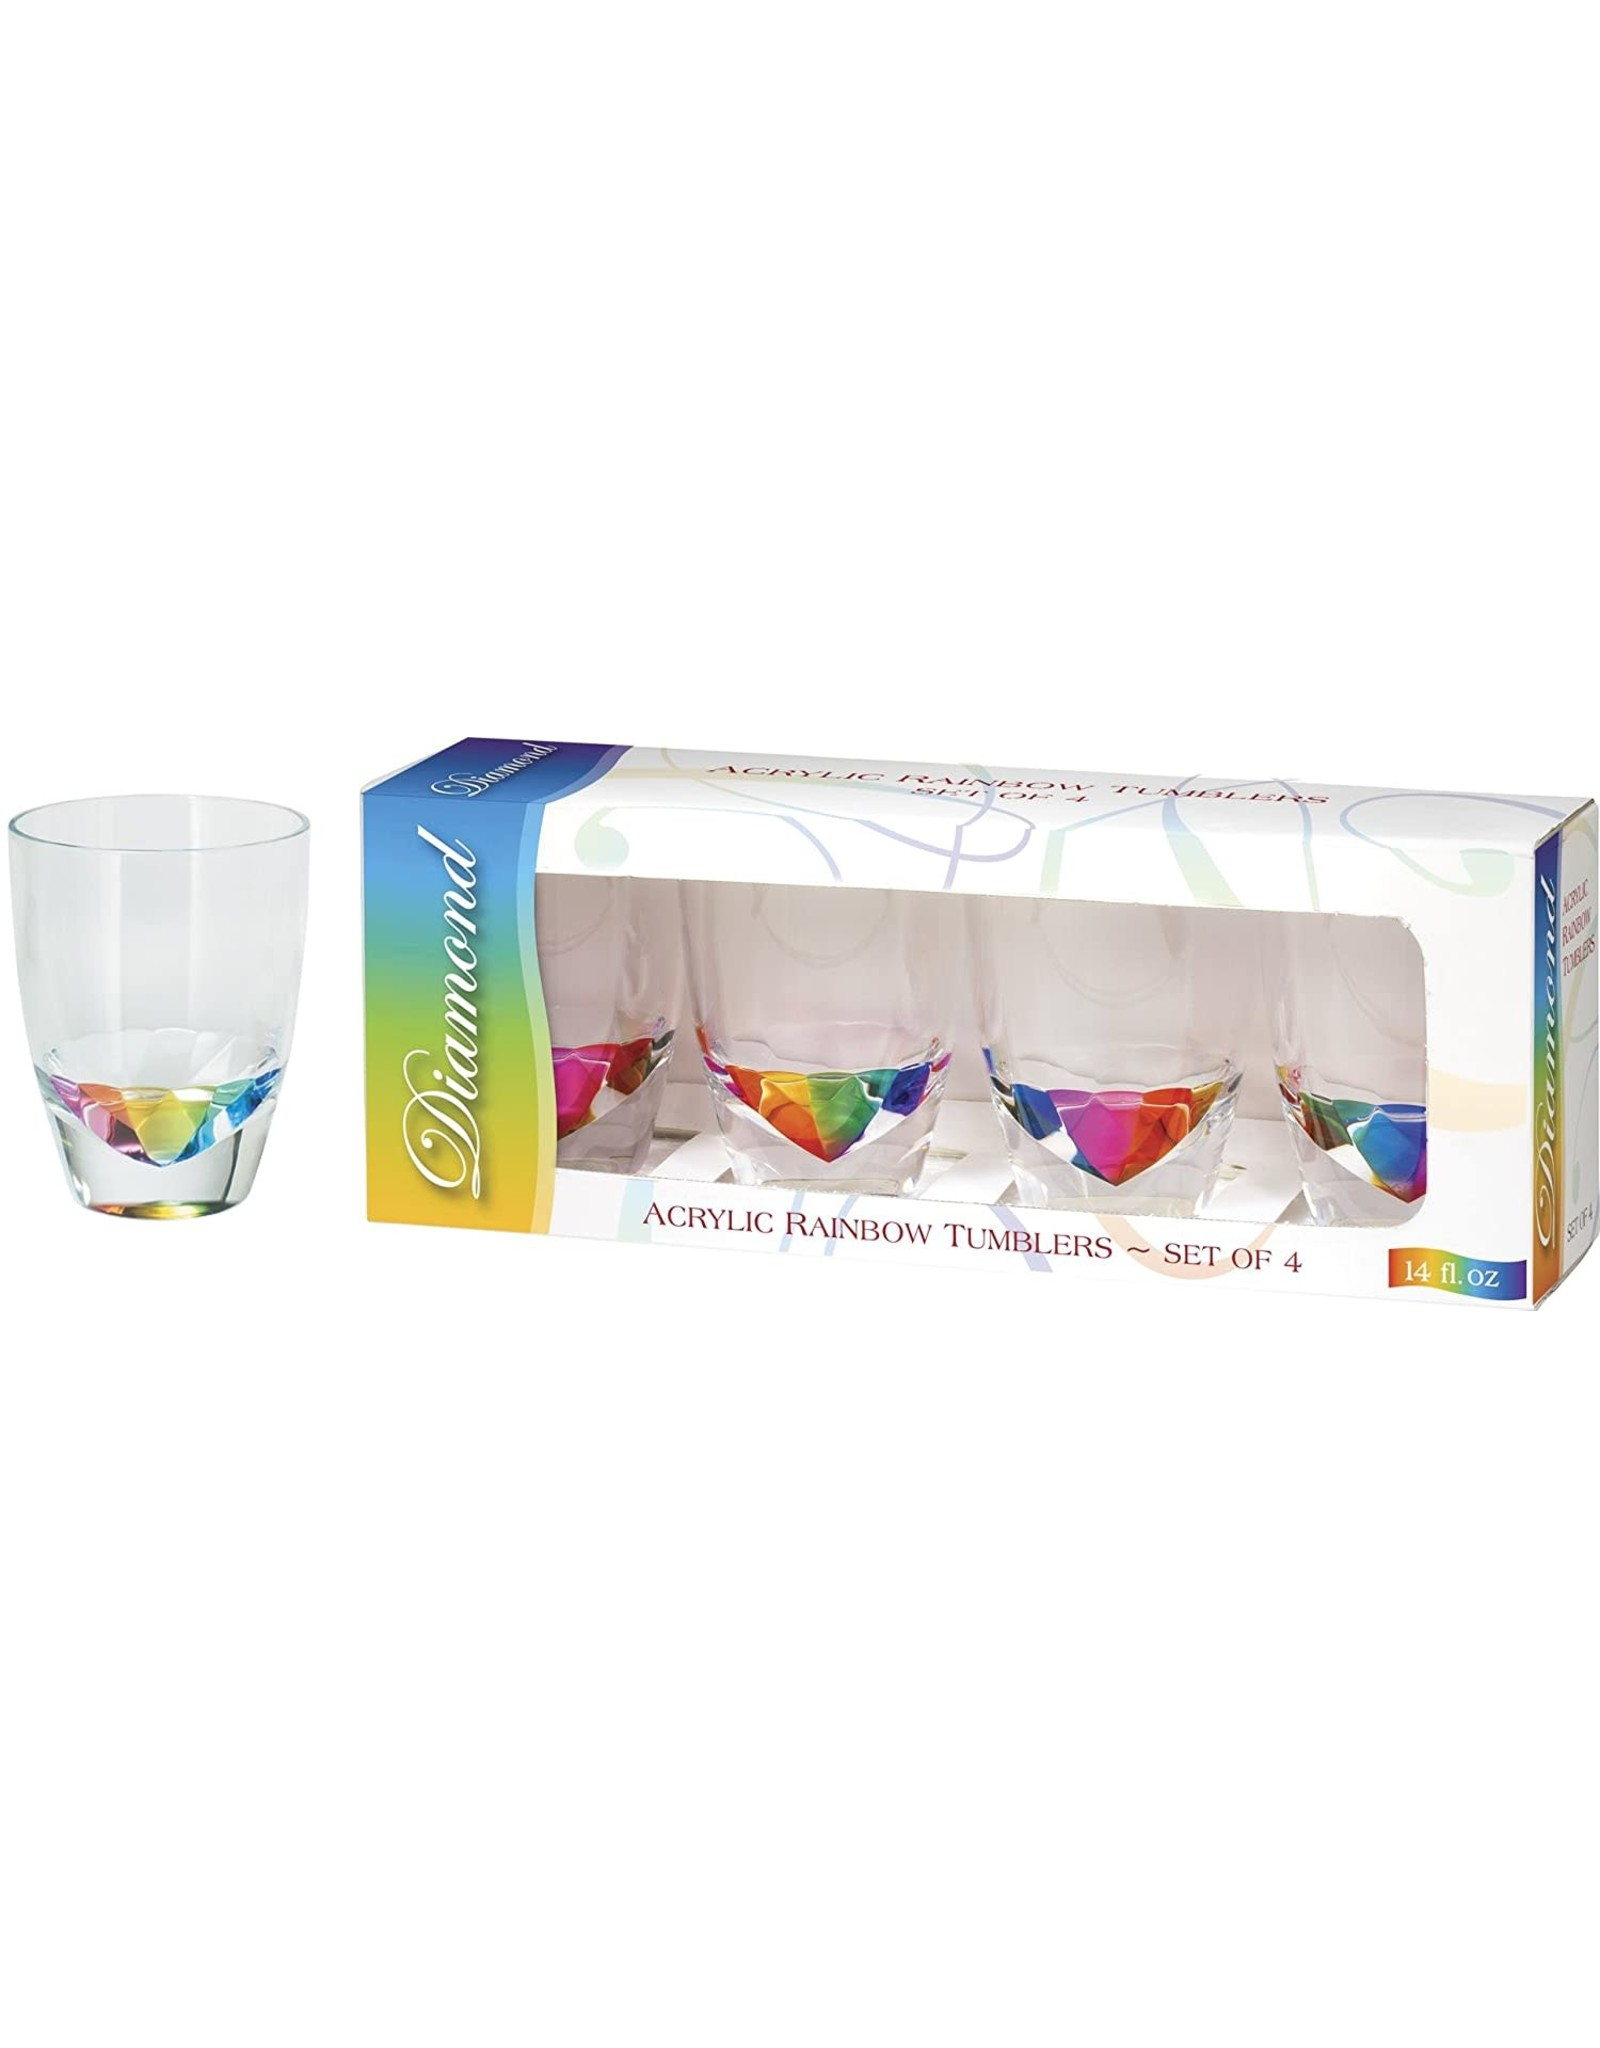 Merritt International Acrylic Rainbow DOF Glasses 14oz Gift Set Of 4